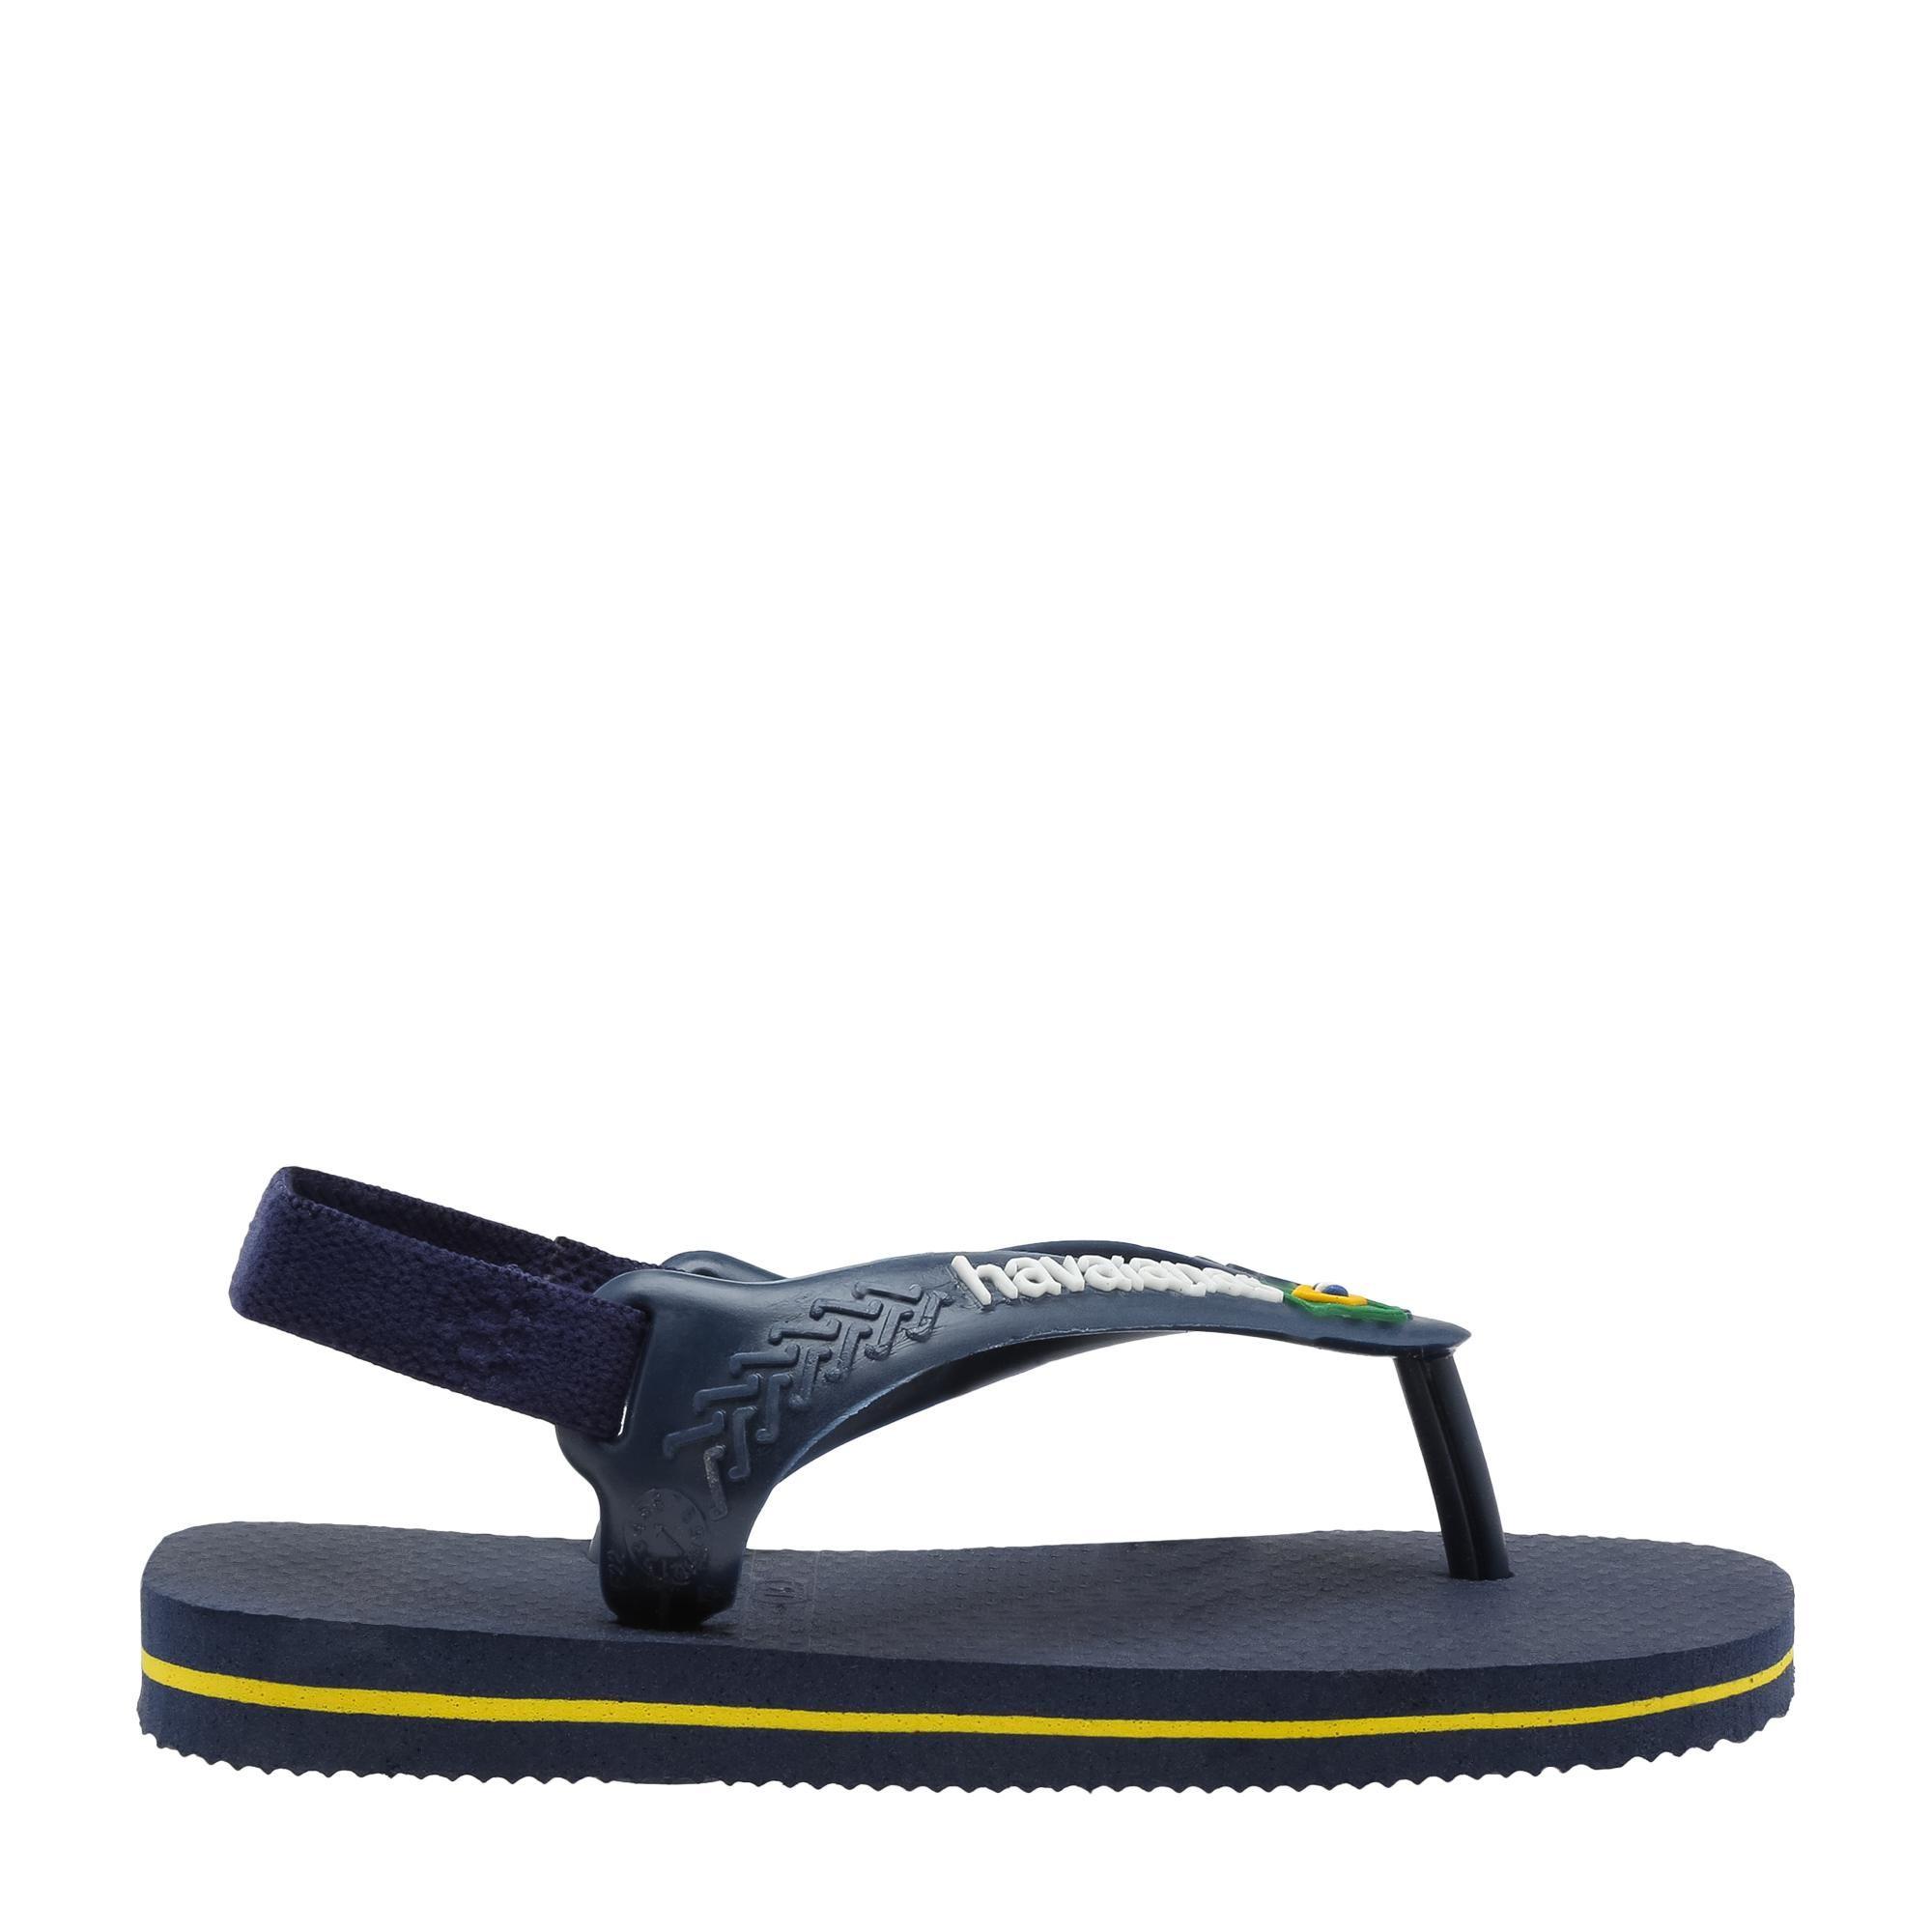 Baby Brasil flip flops